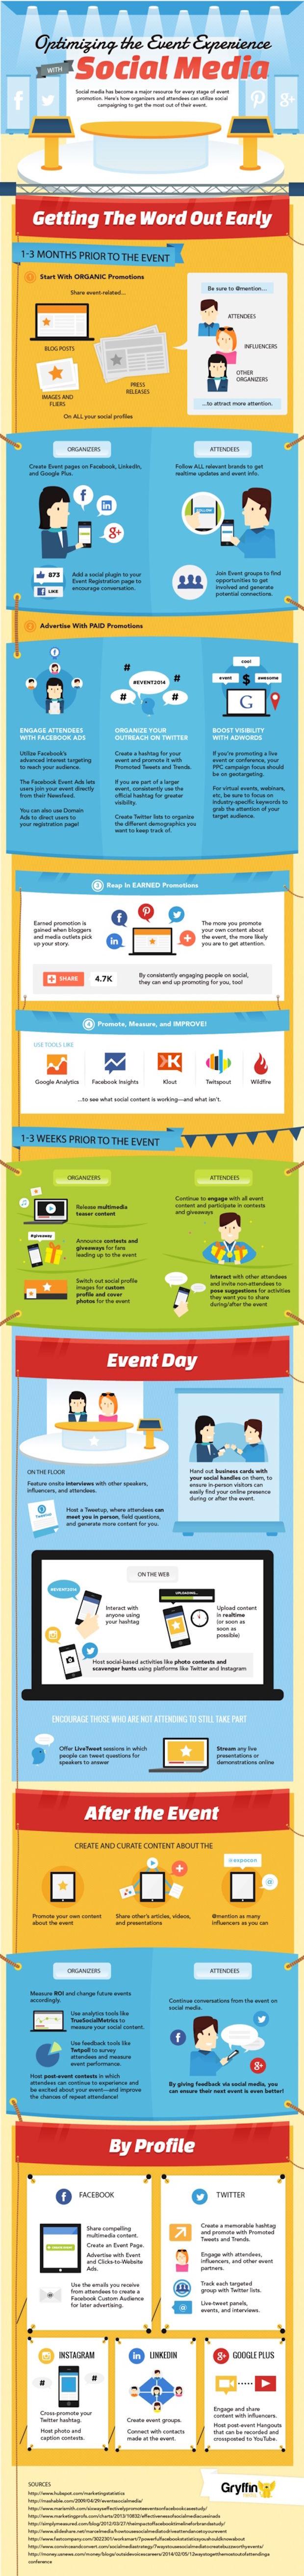 social-media-event-promotion